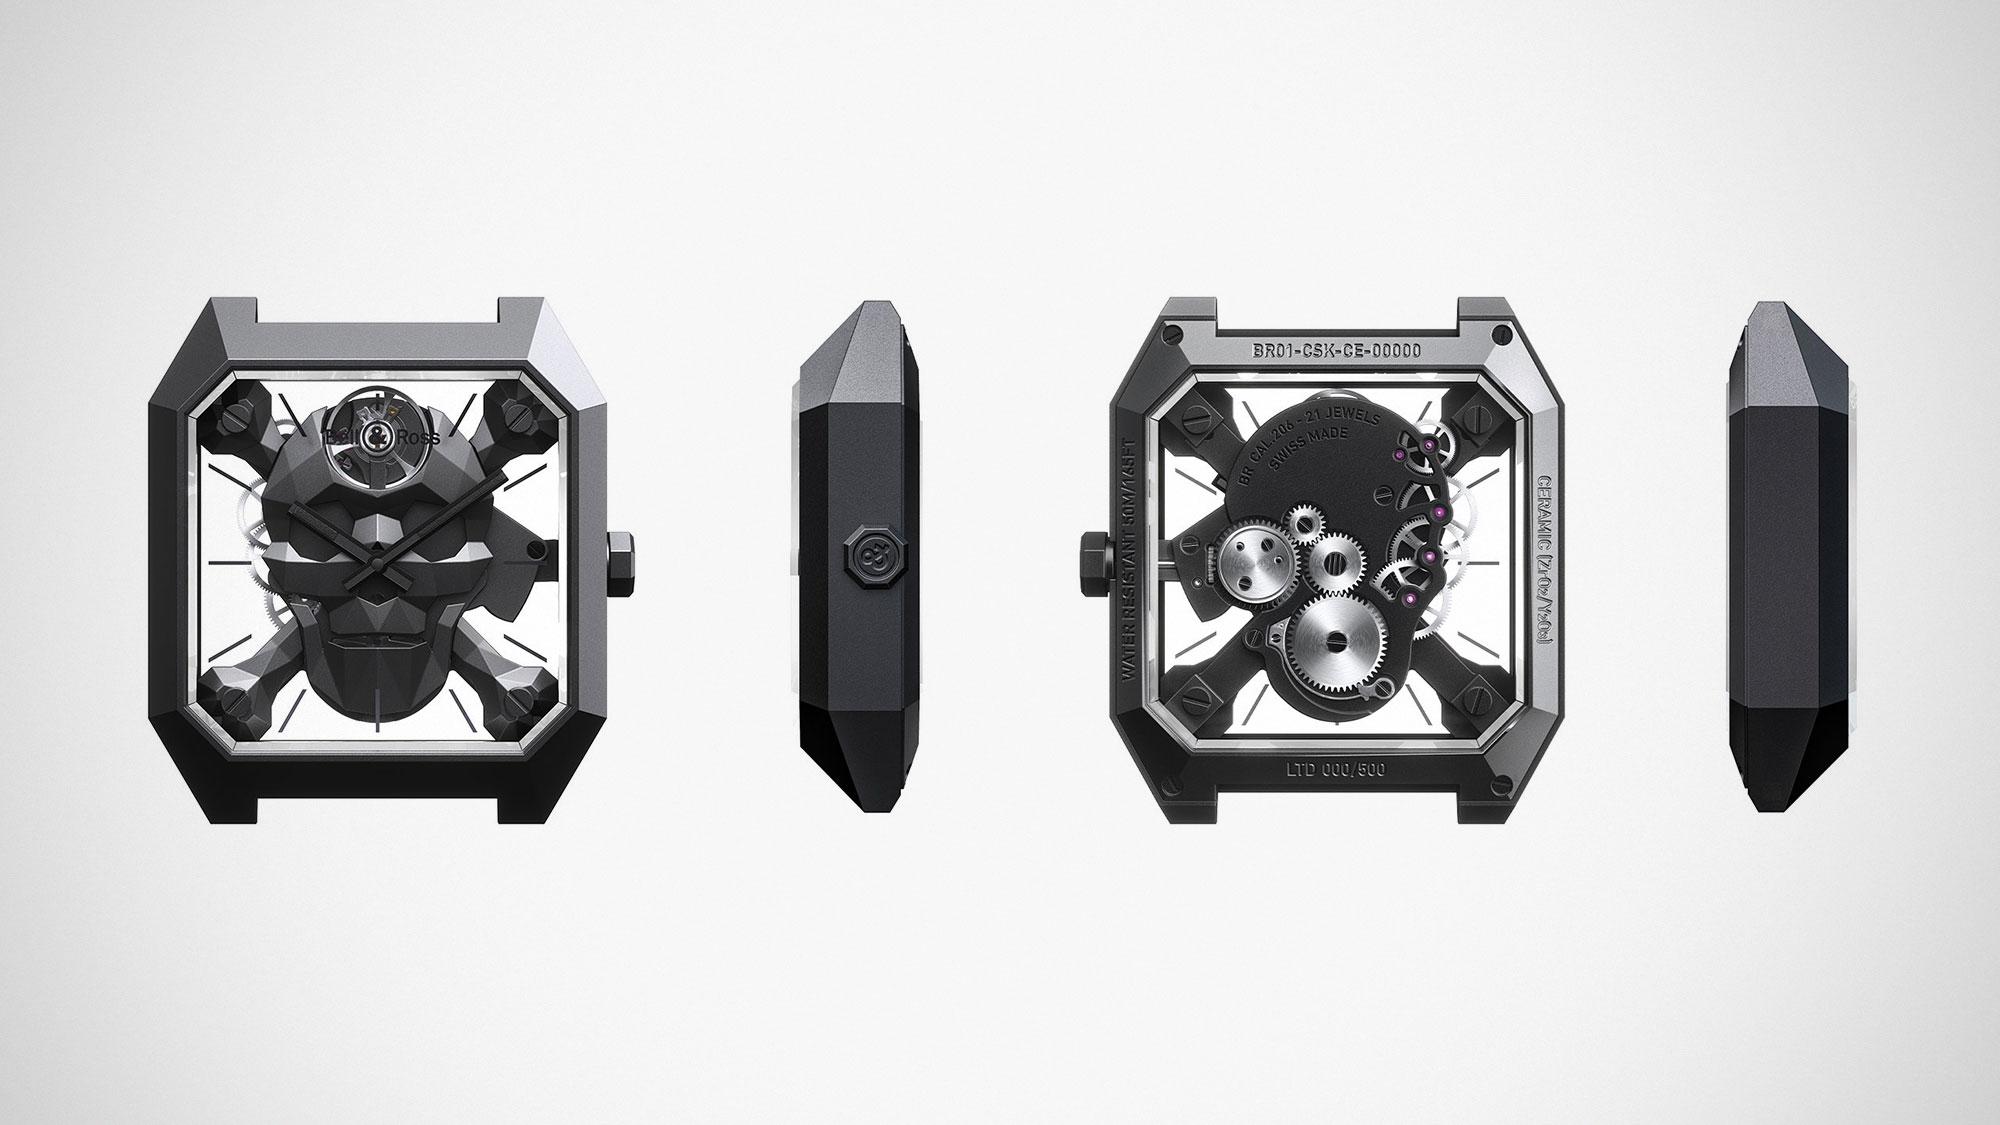 Bell & Ross BR 01 Cyber Skull Luxury Timepiece